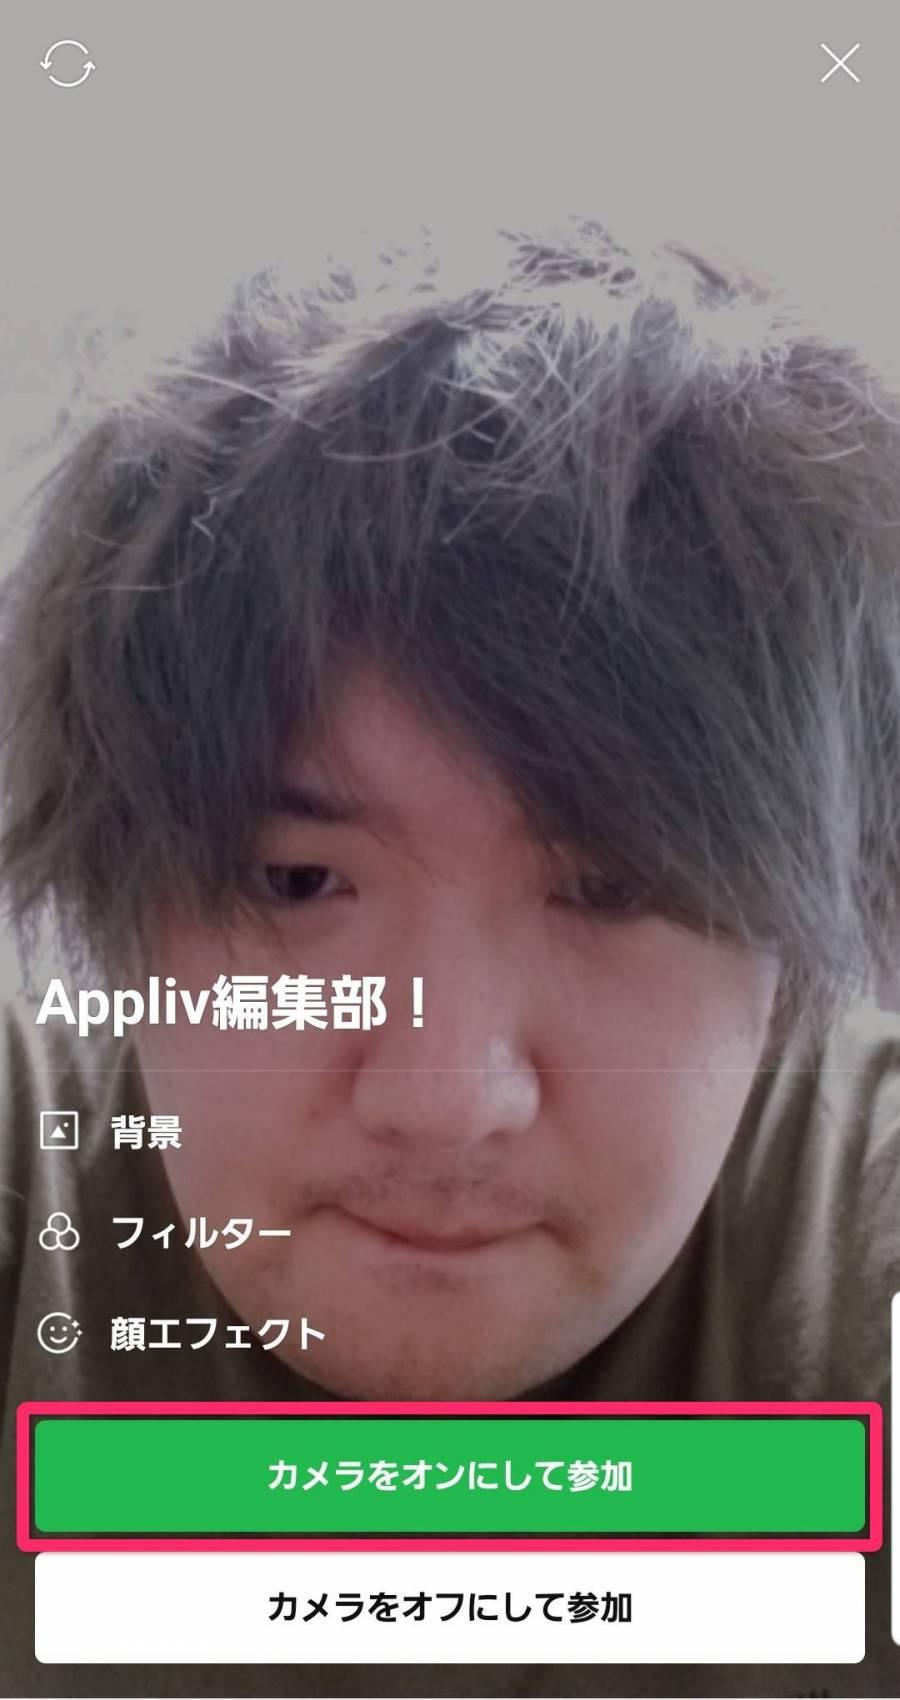 Android版LINEビデオ通話プレビュー